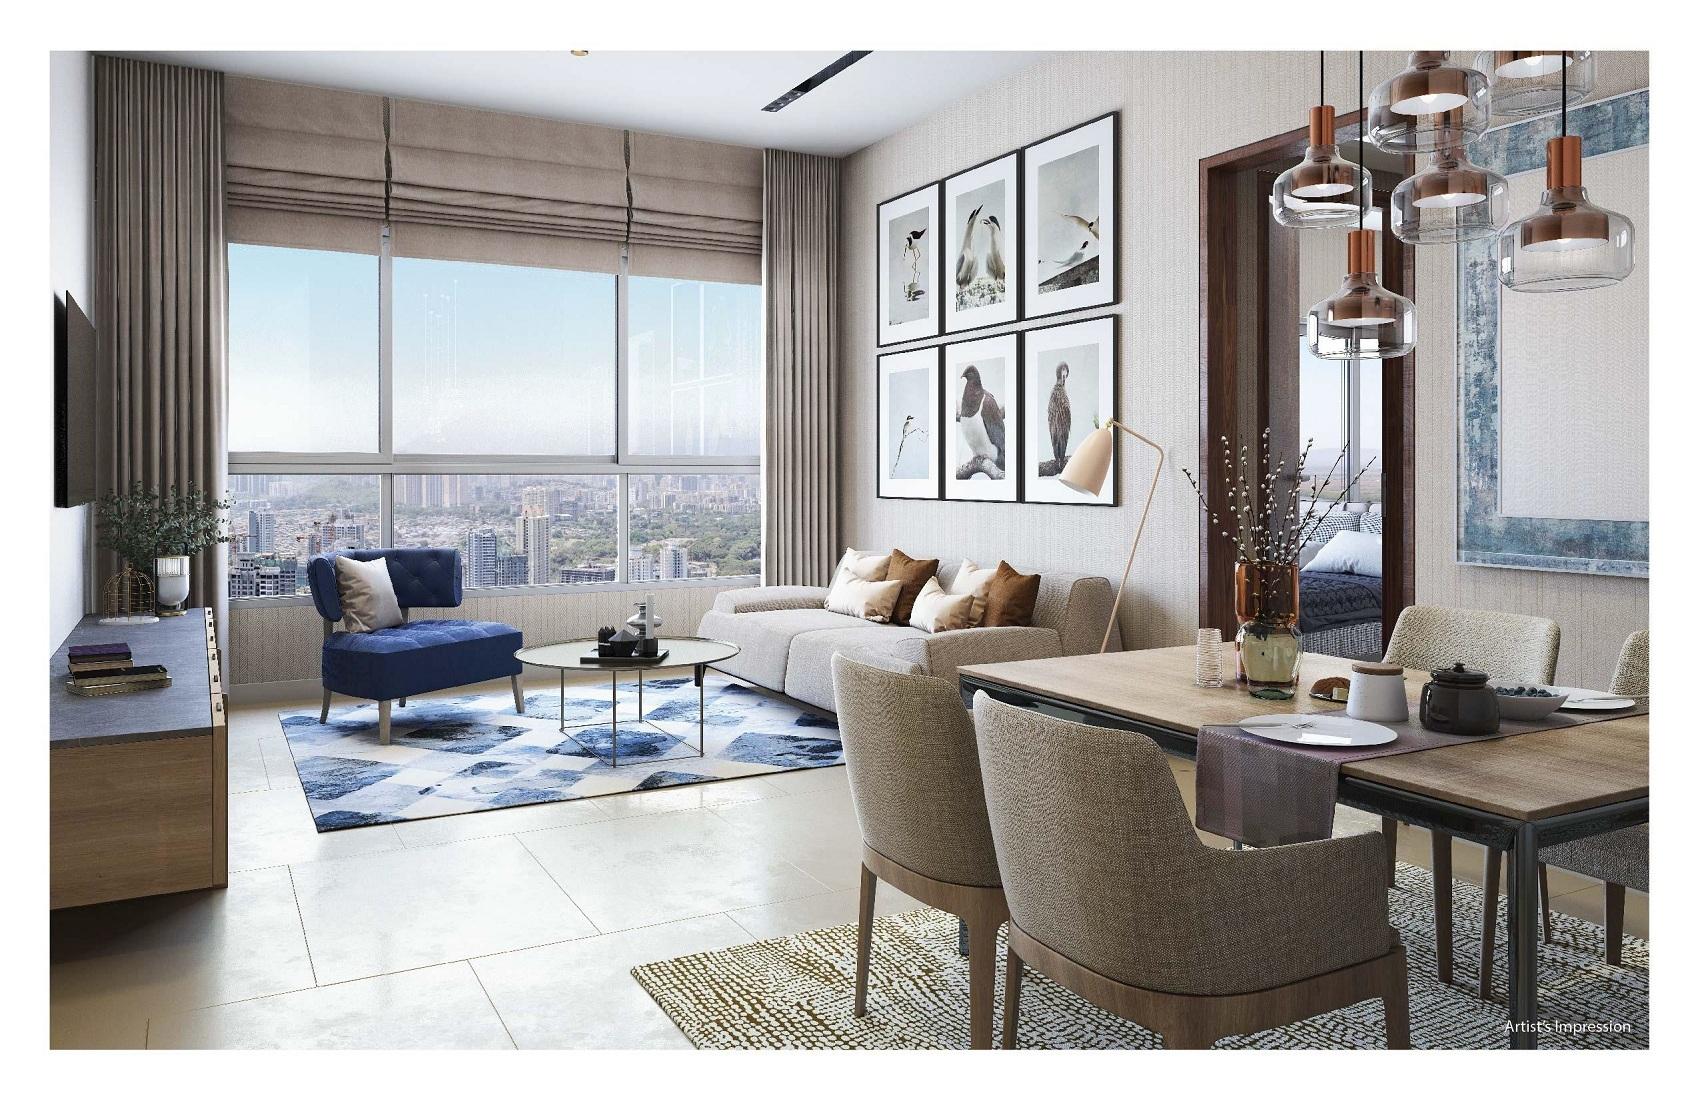 piramal vaikunth phase ii project apartment interiors1